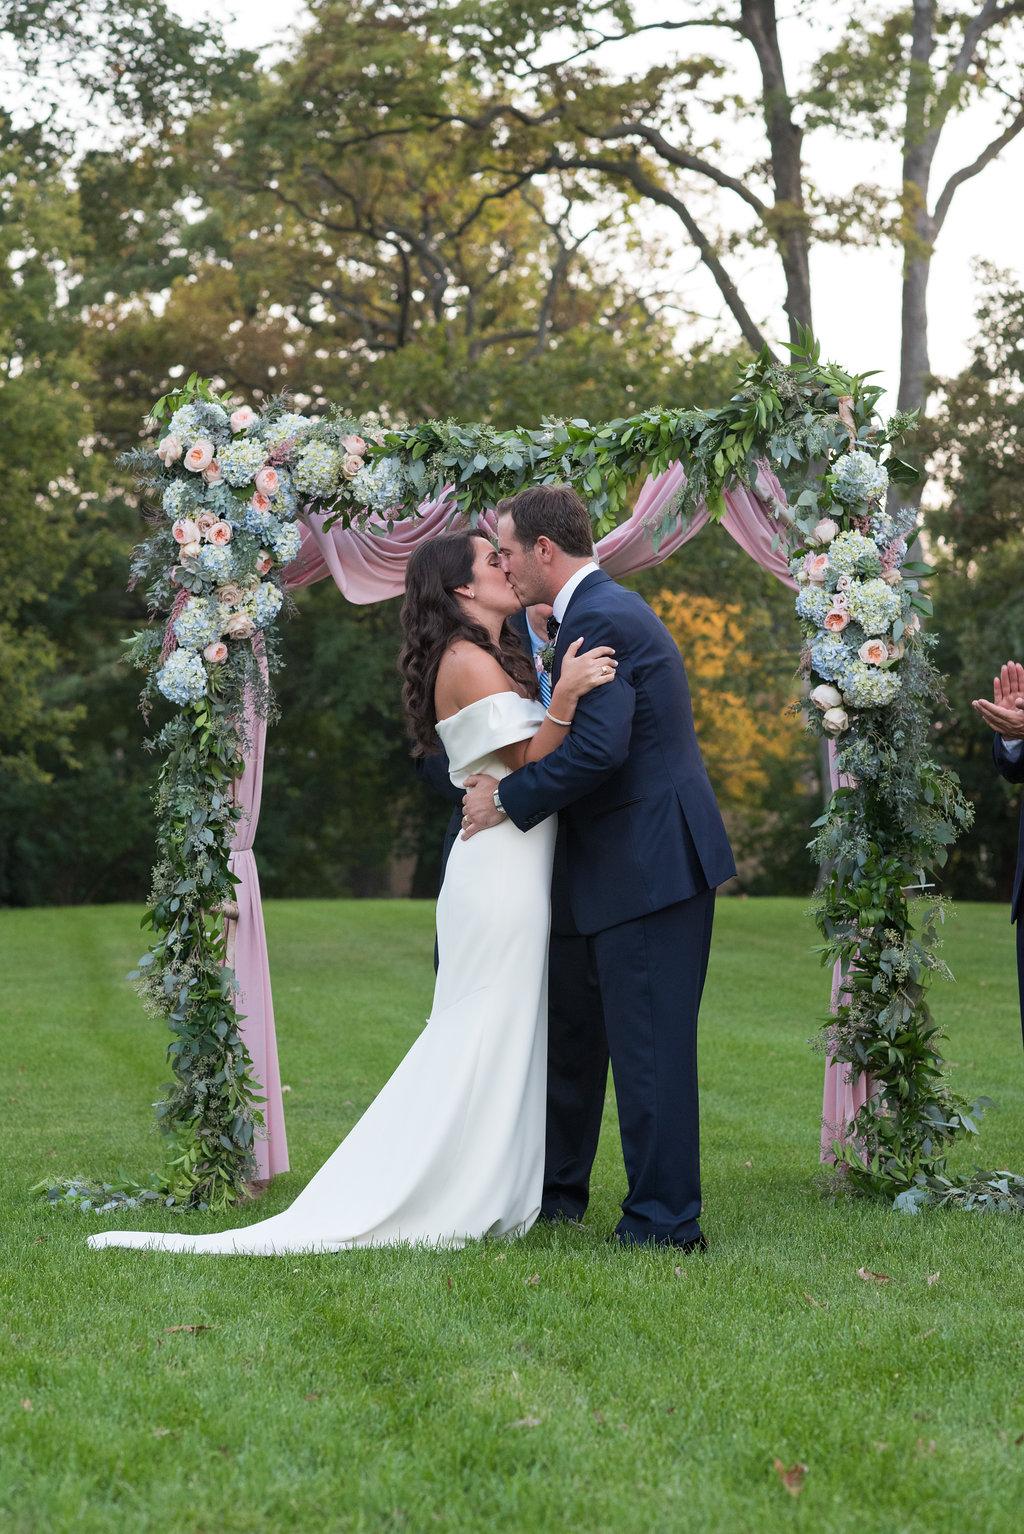 HighlandPark-Wedding-Flower-Arch.jpeg